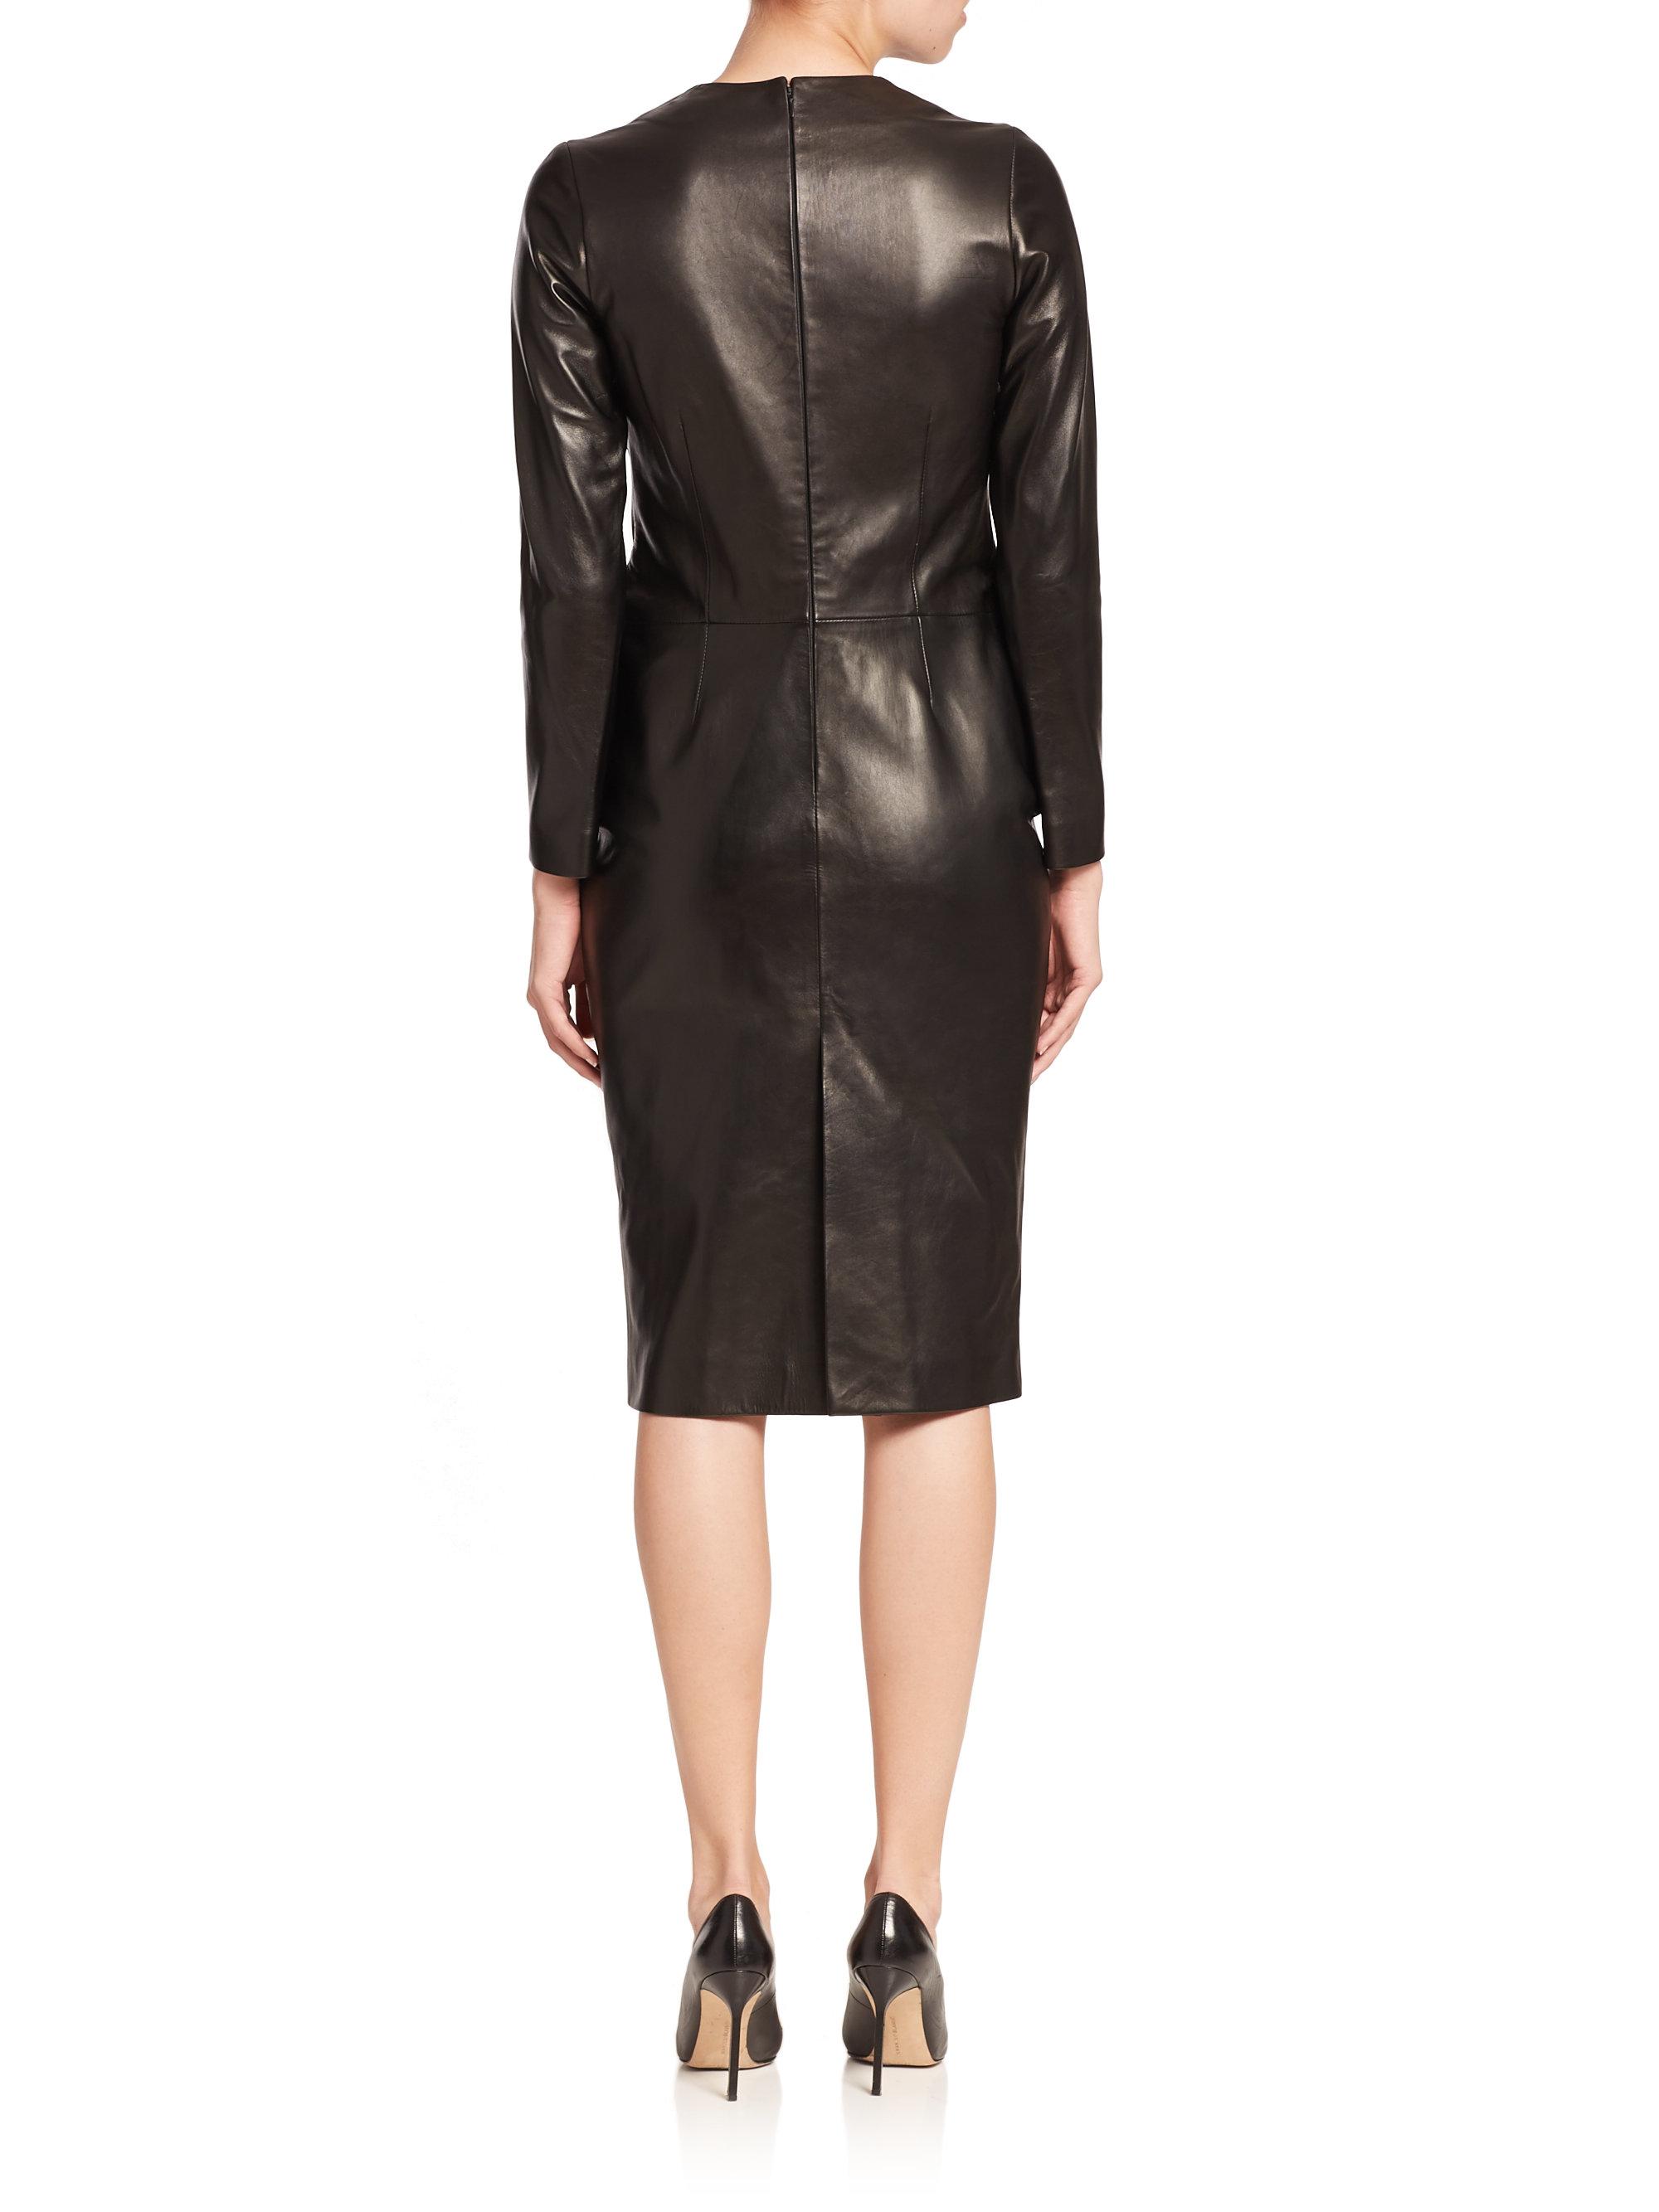 983c93e6a3 La Prestic Ouiston Parfaite Long-sleeve Leather Dress in Black - Lyst